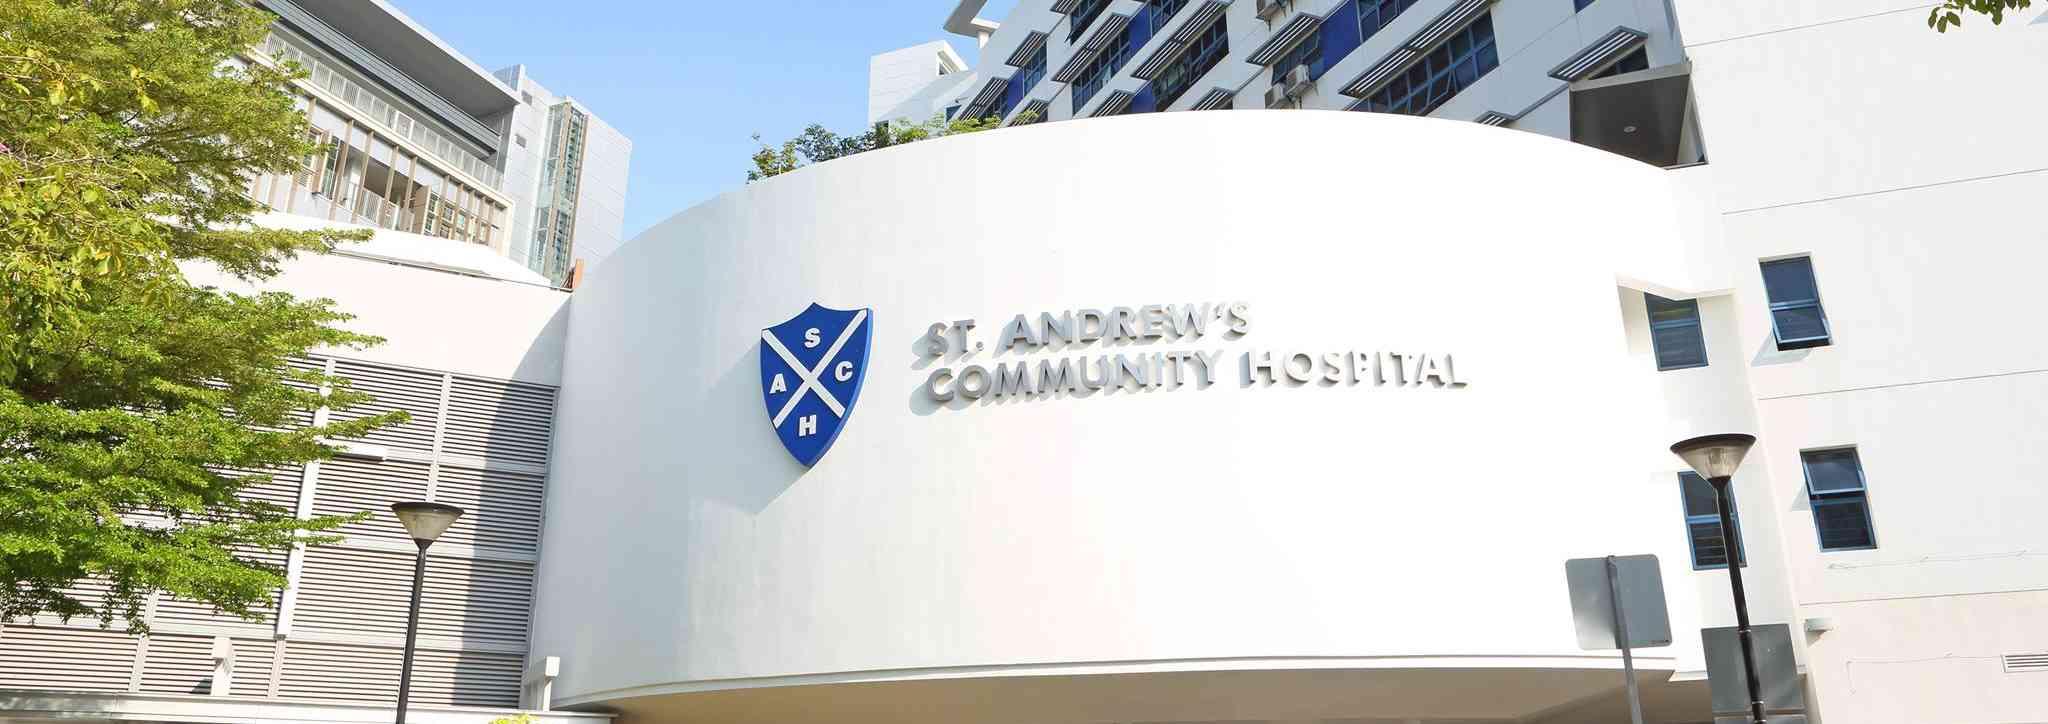 St. Andrew's Community Hospital • 圣安德烈社区医院